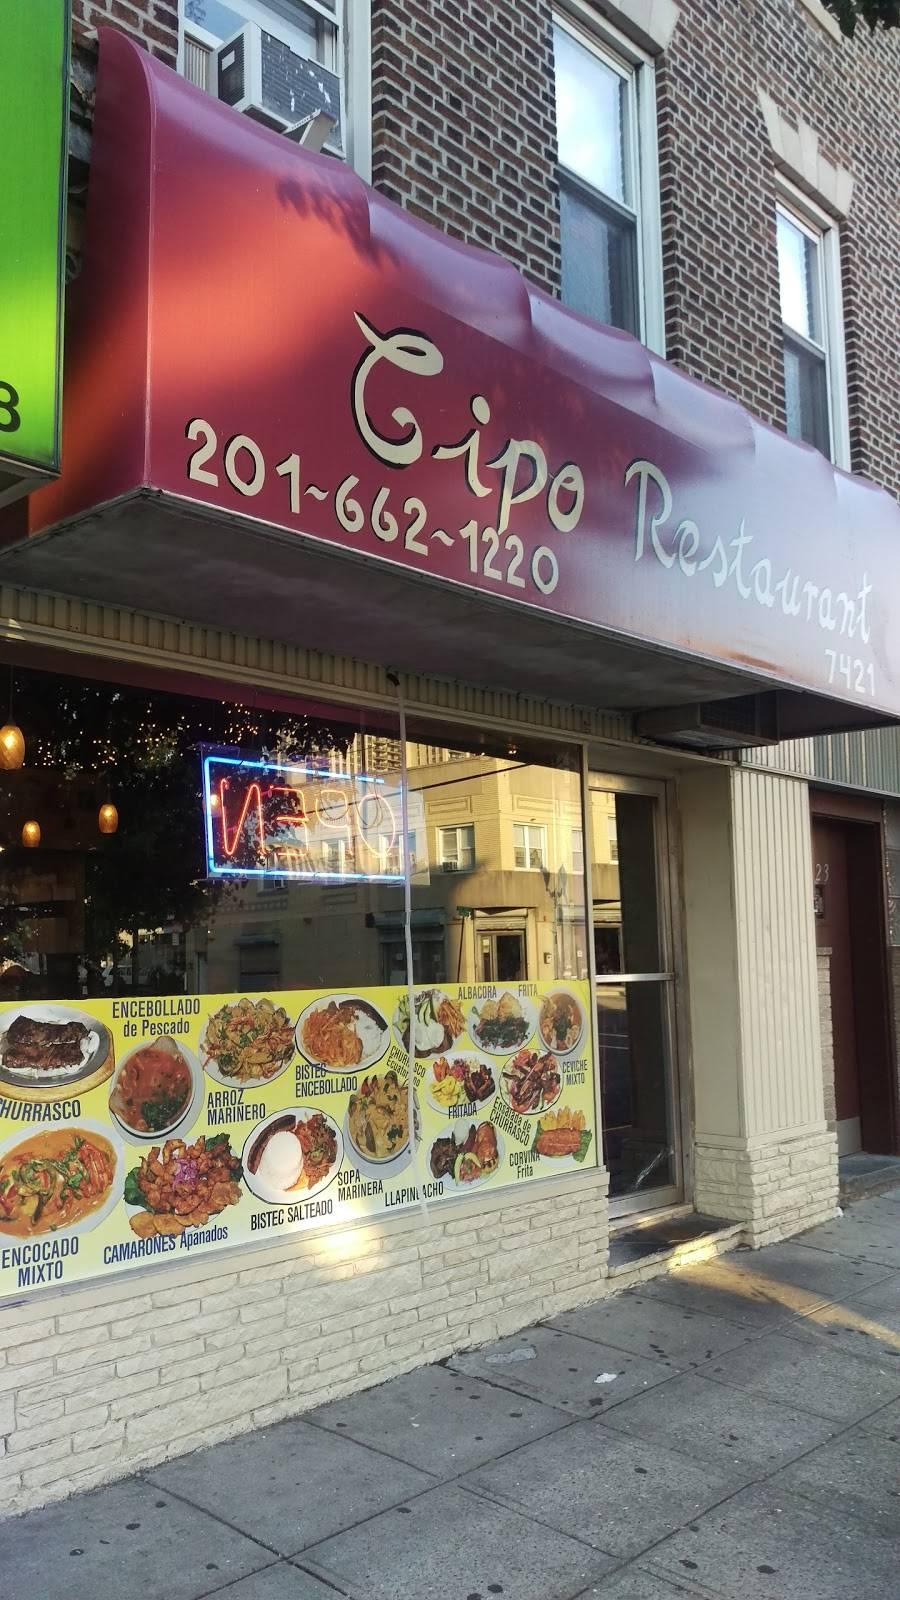 Cipo Restaurant | restaurant | 7421 Broadway, North Bergen, NJ 07047, USA | 2016621220 OR +1 201-662-1220